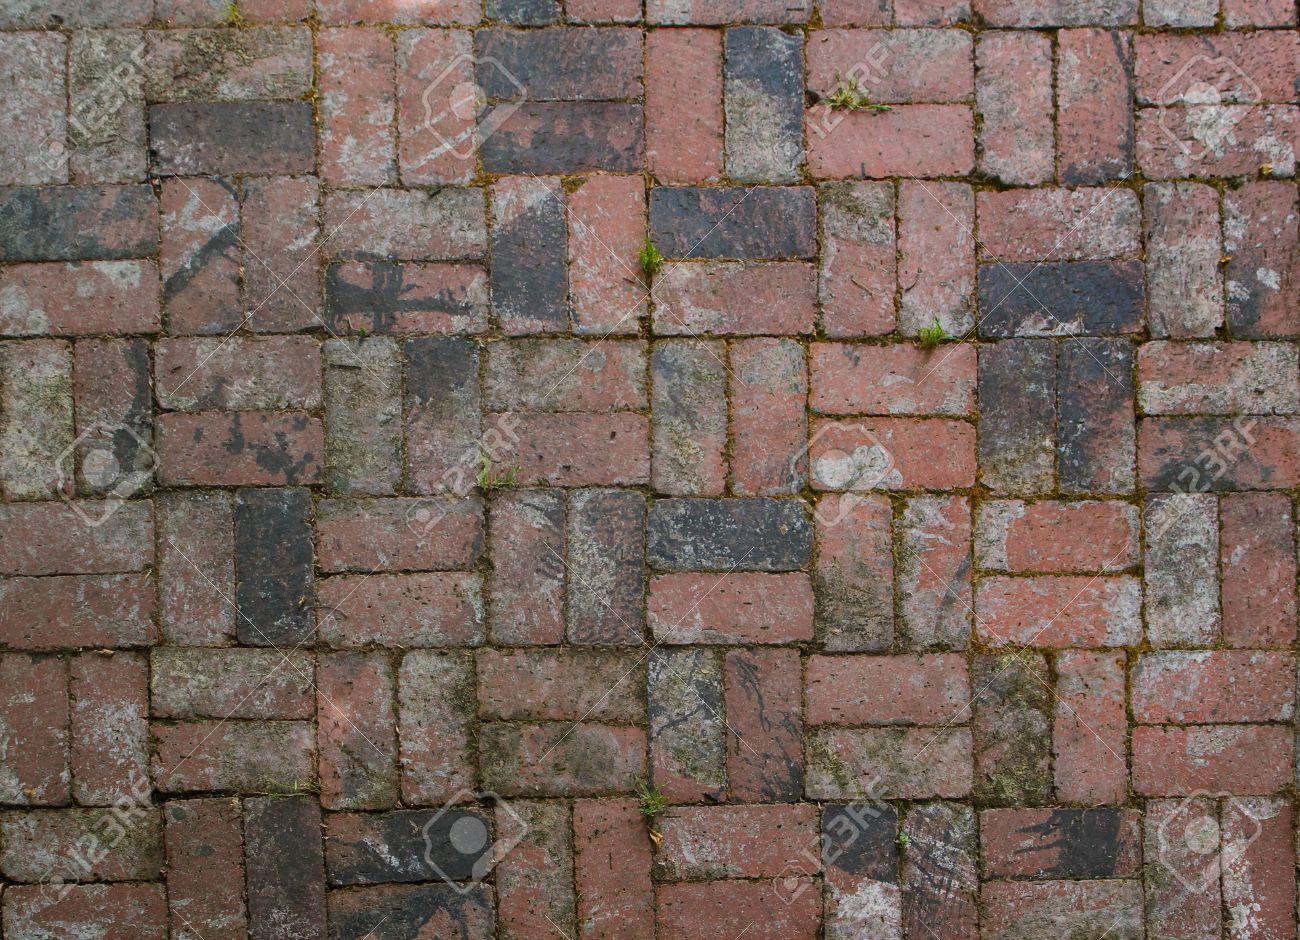 Old Factory Brick Used In Alternating Pattern Patio Floor Stock